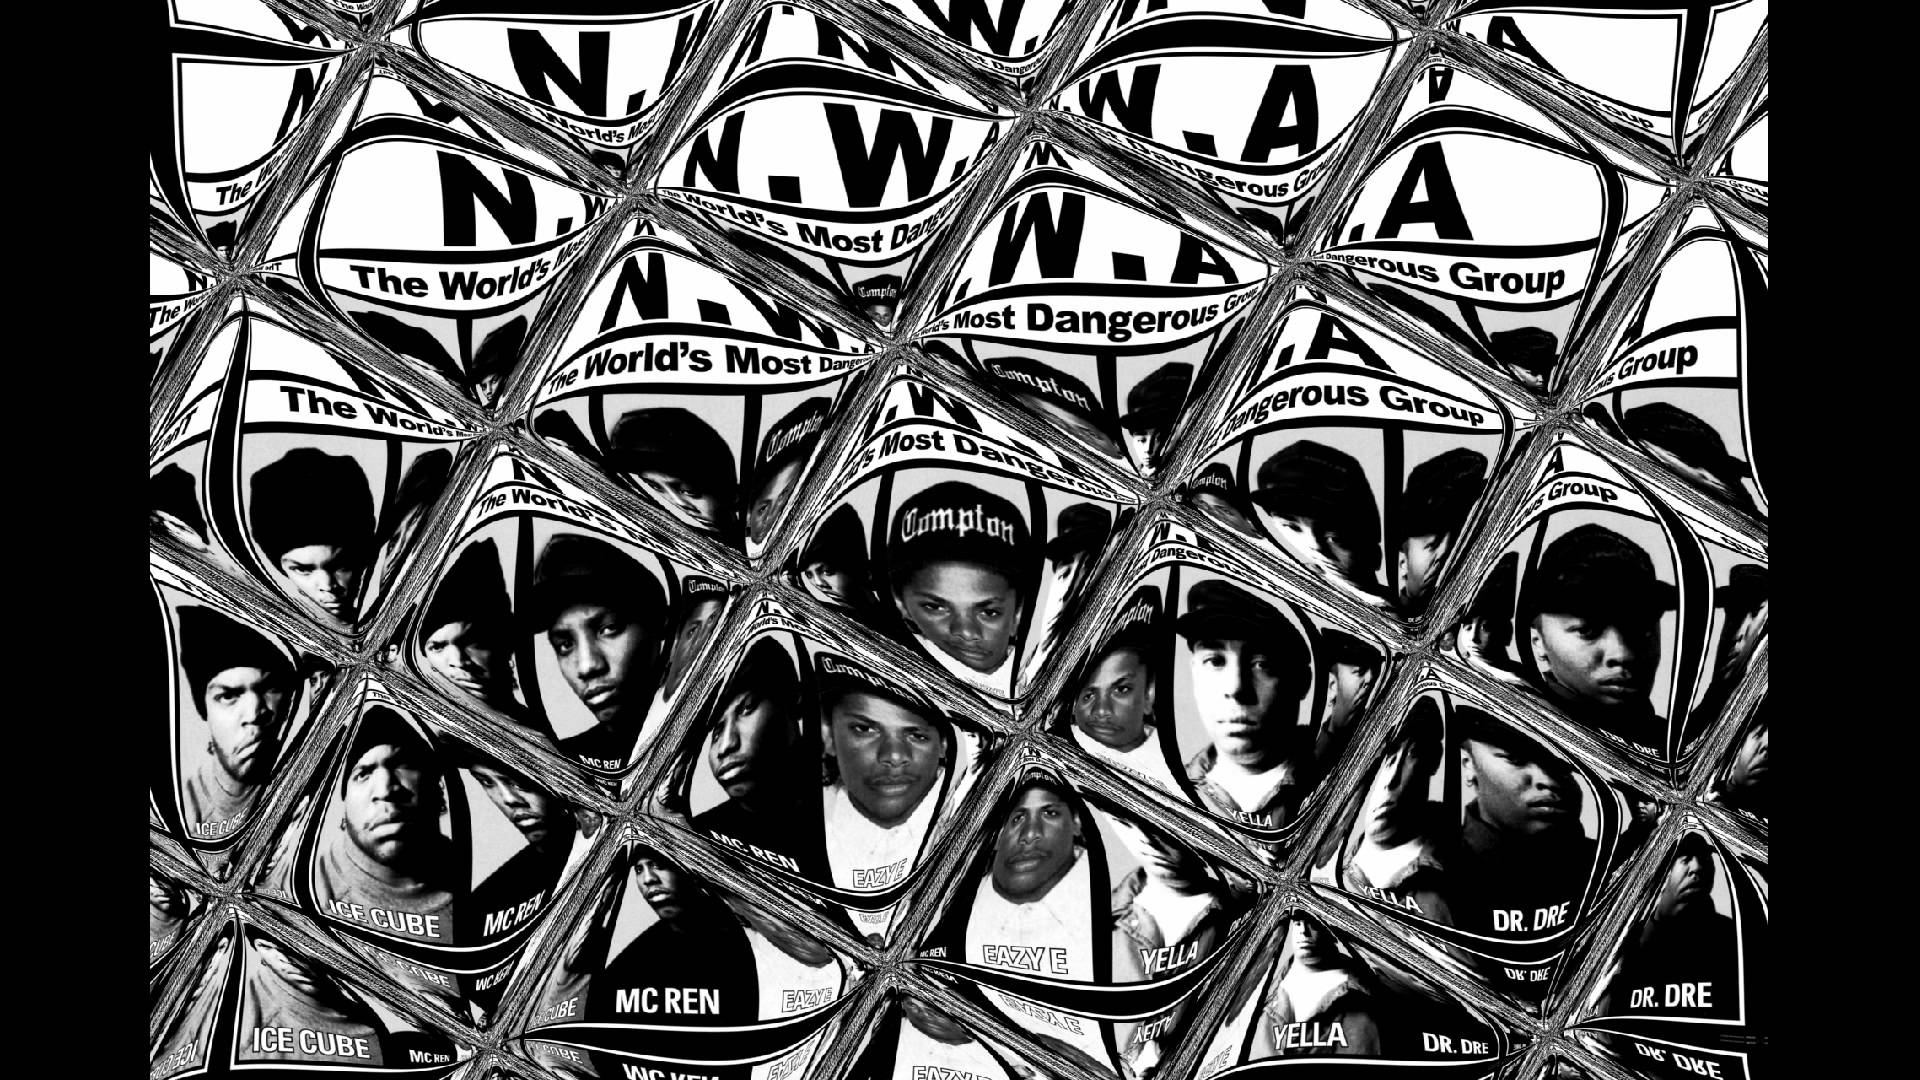 Nwa Wallpapers 1920x1080